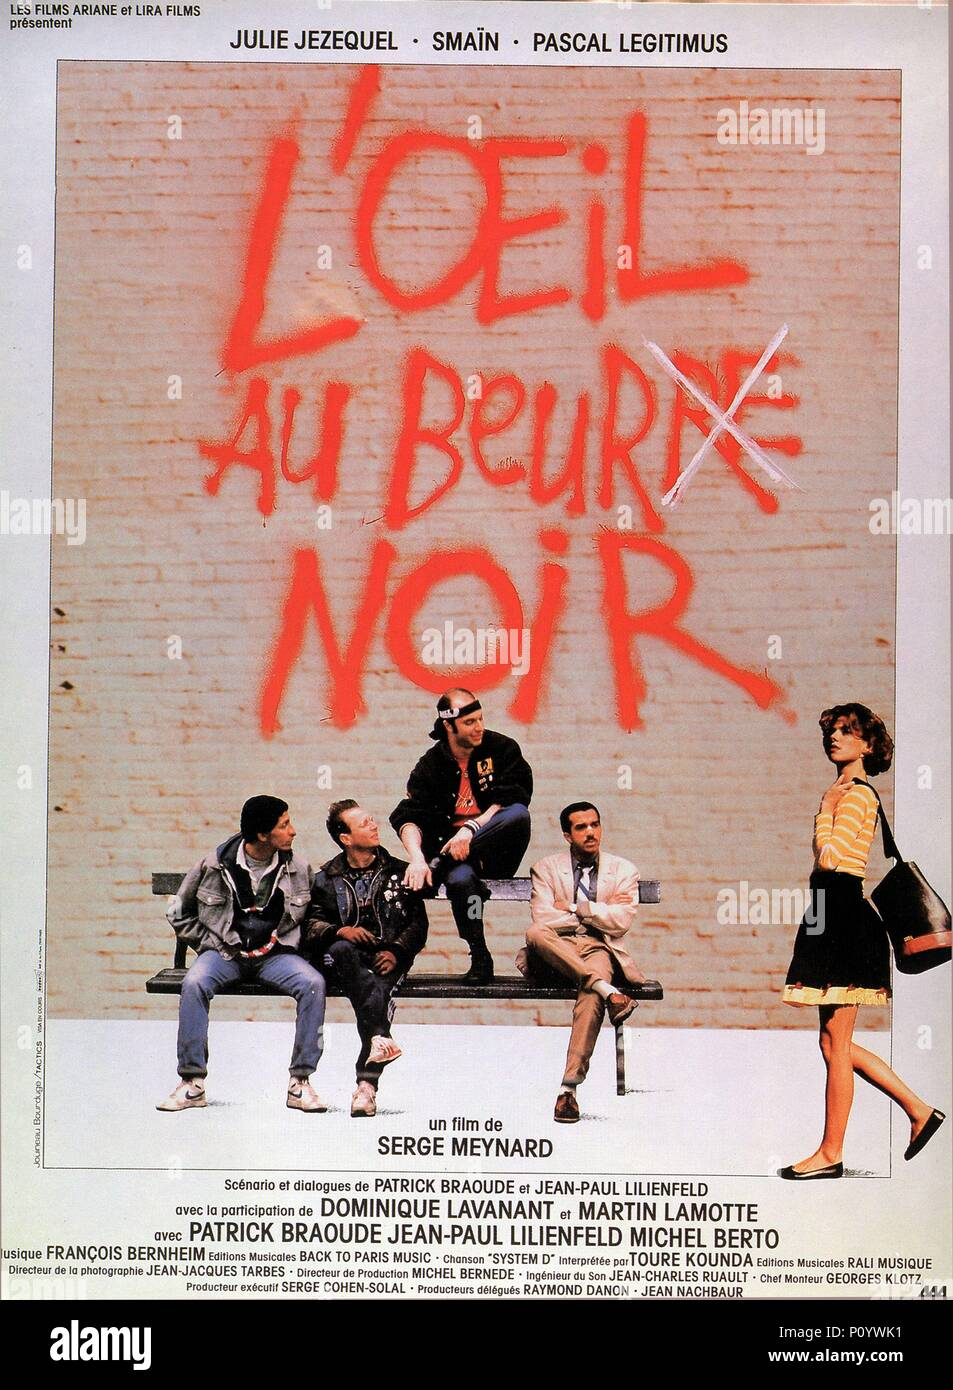 Original Film Title: OEIL AU BEUR.  English Title: OEIL AU BEUR.  Film Director: SERGE MEYNARD.  Year: 1987. Credit: LES FILMS ARIANE/ARTISTES ASSOCIES / Album - Stock Image